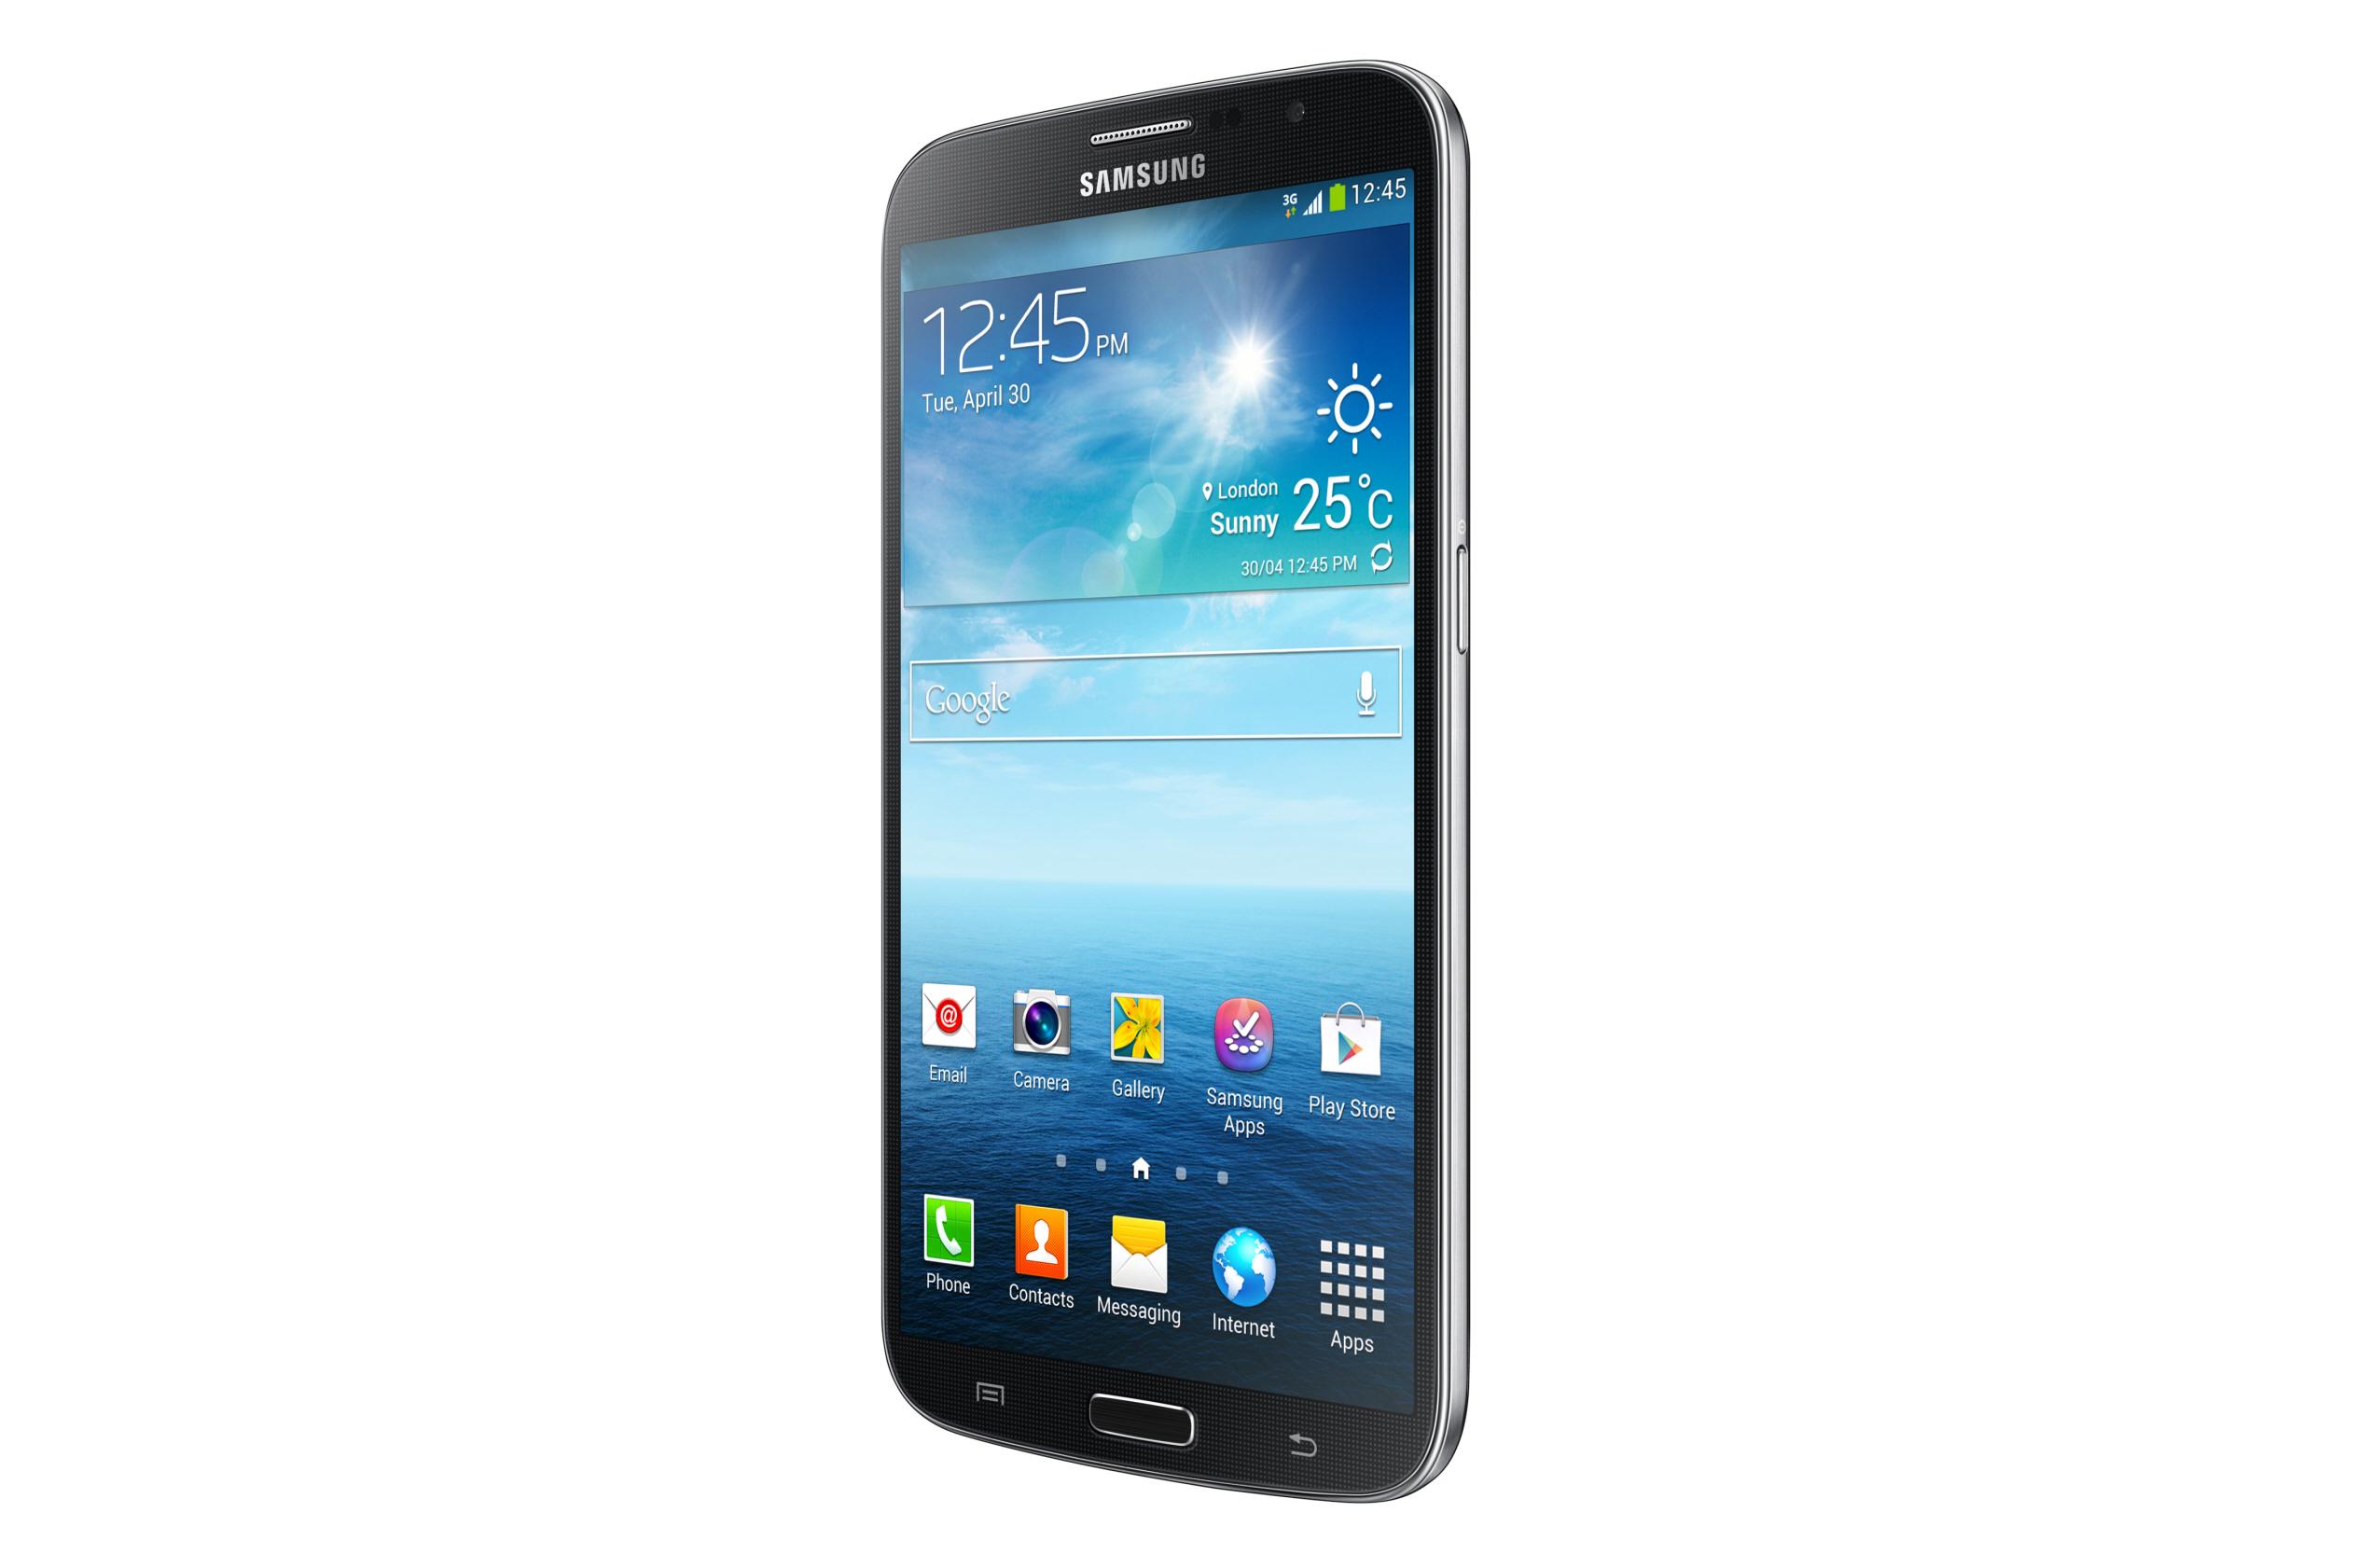 Samsung Galaxy MegaTM (Photo: Business Wire)